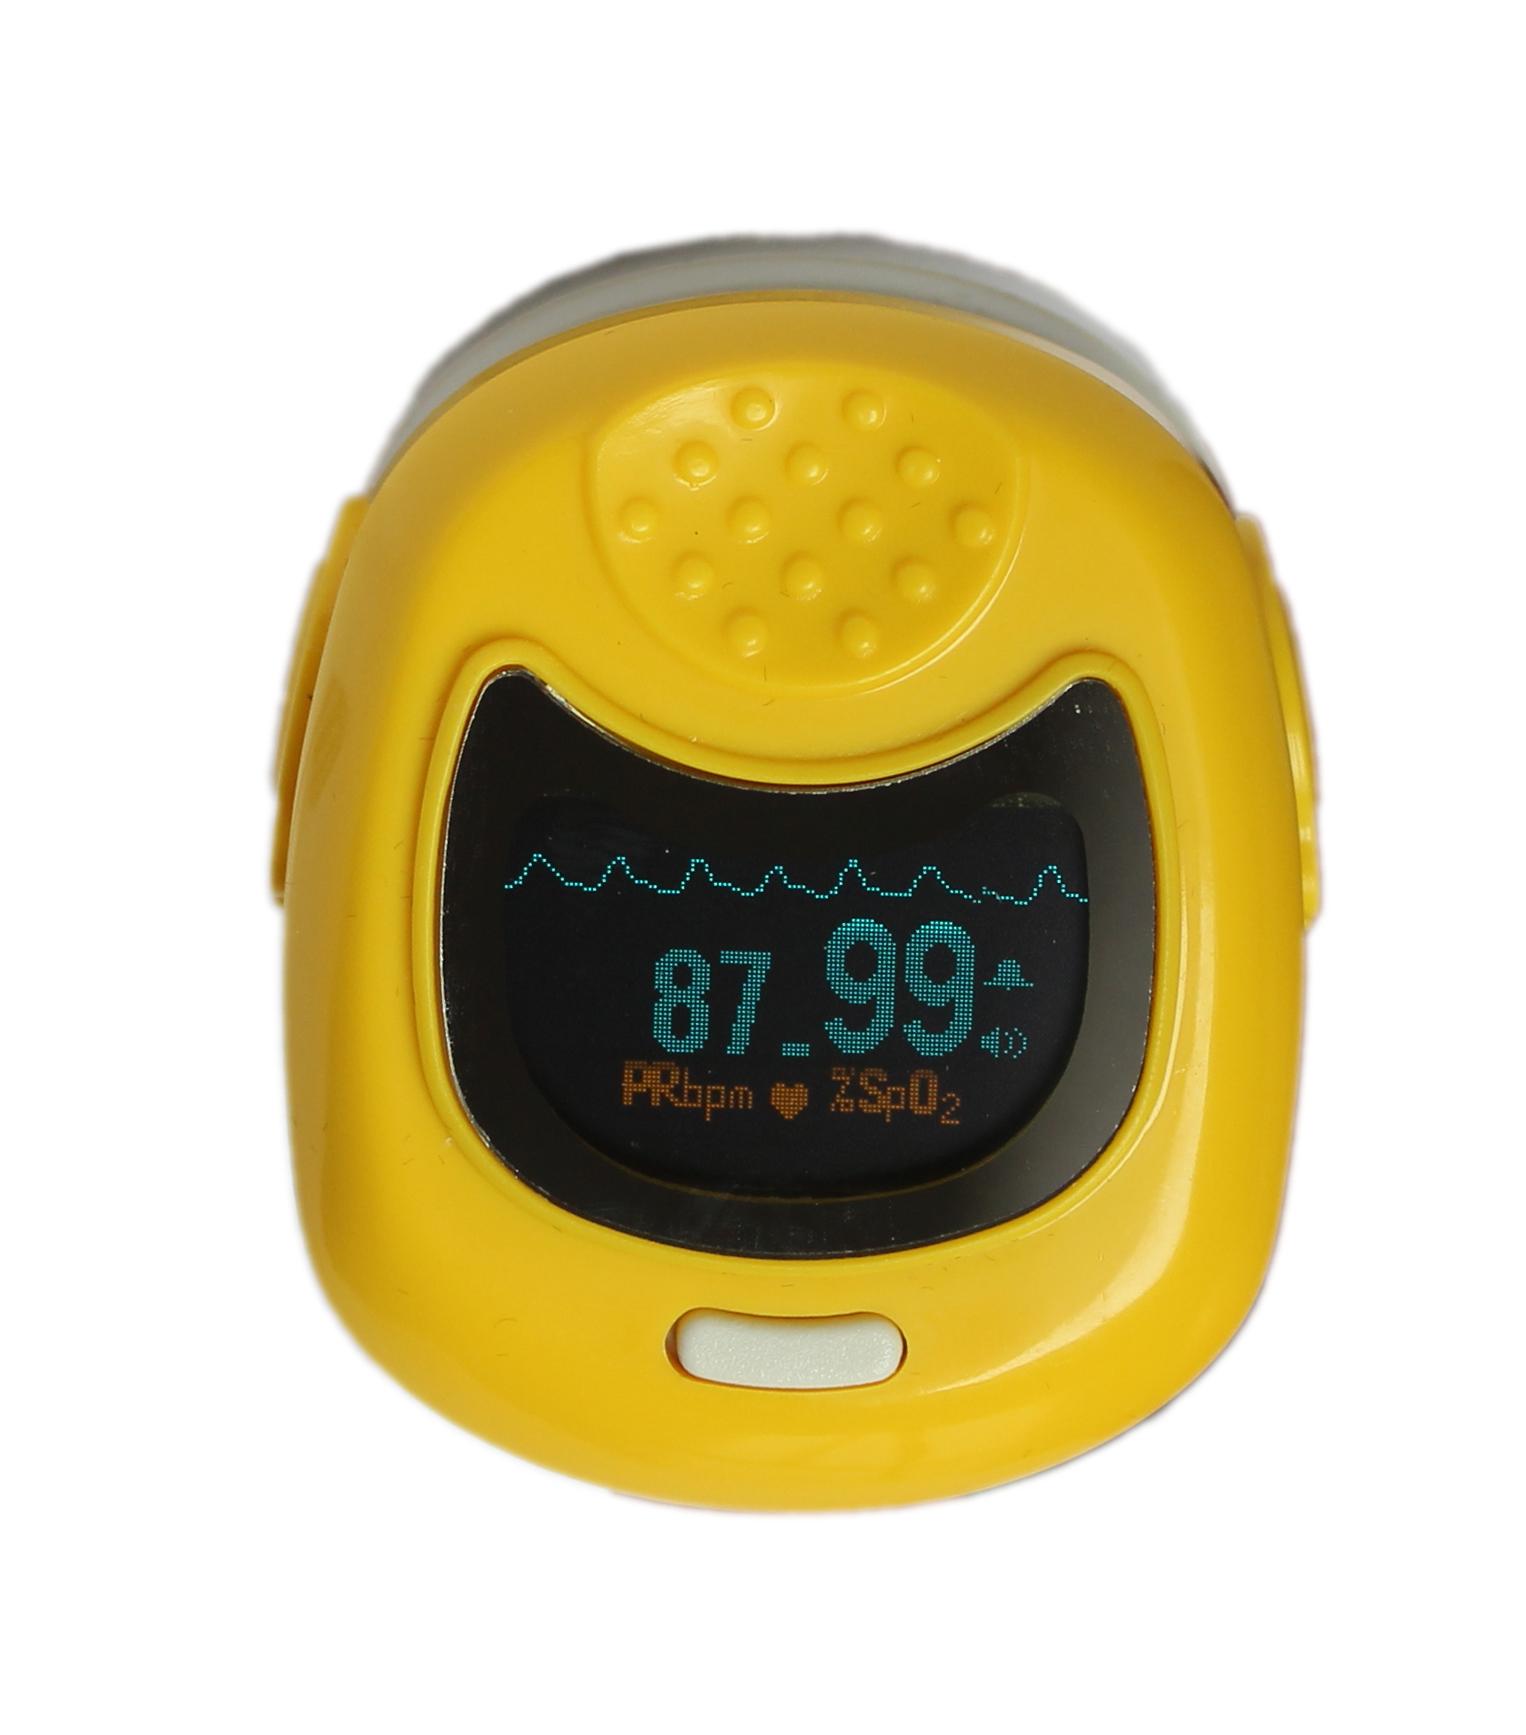 Colour Contec Child/ Pediatric Pulse Oximeter CMS50QB Yellow